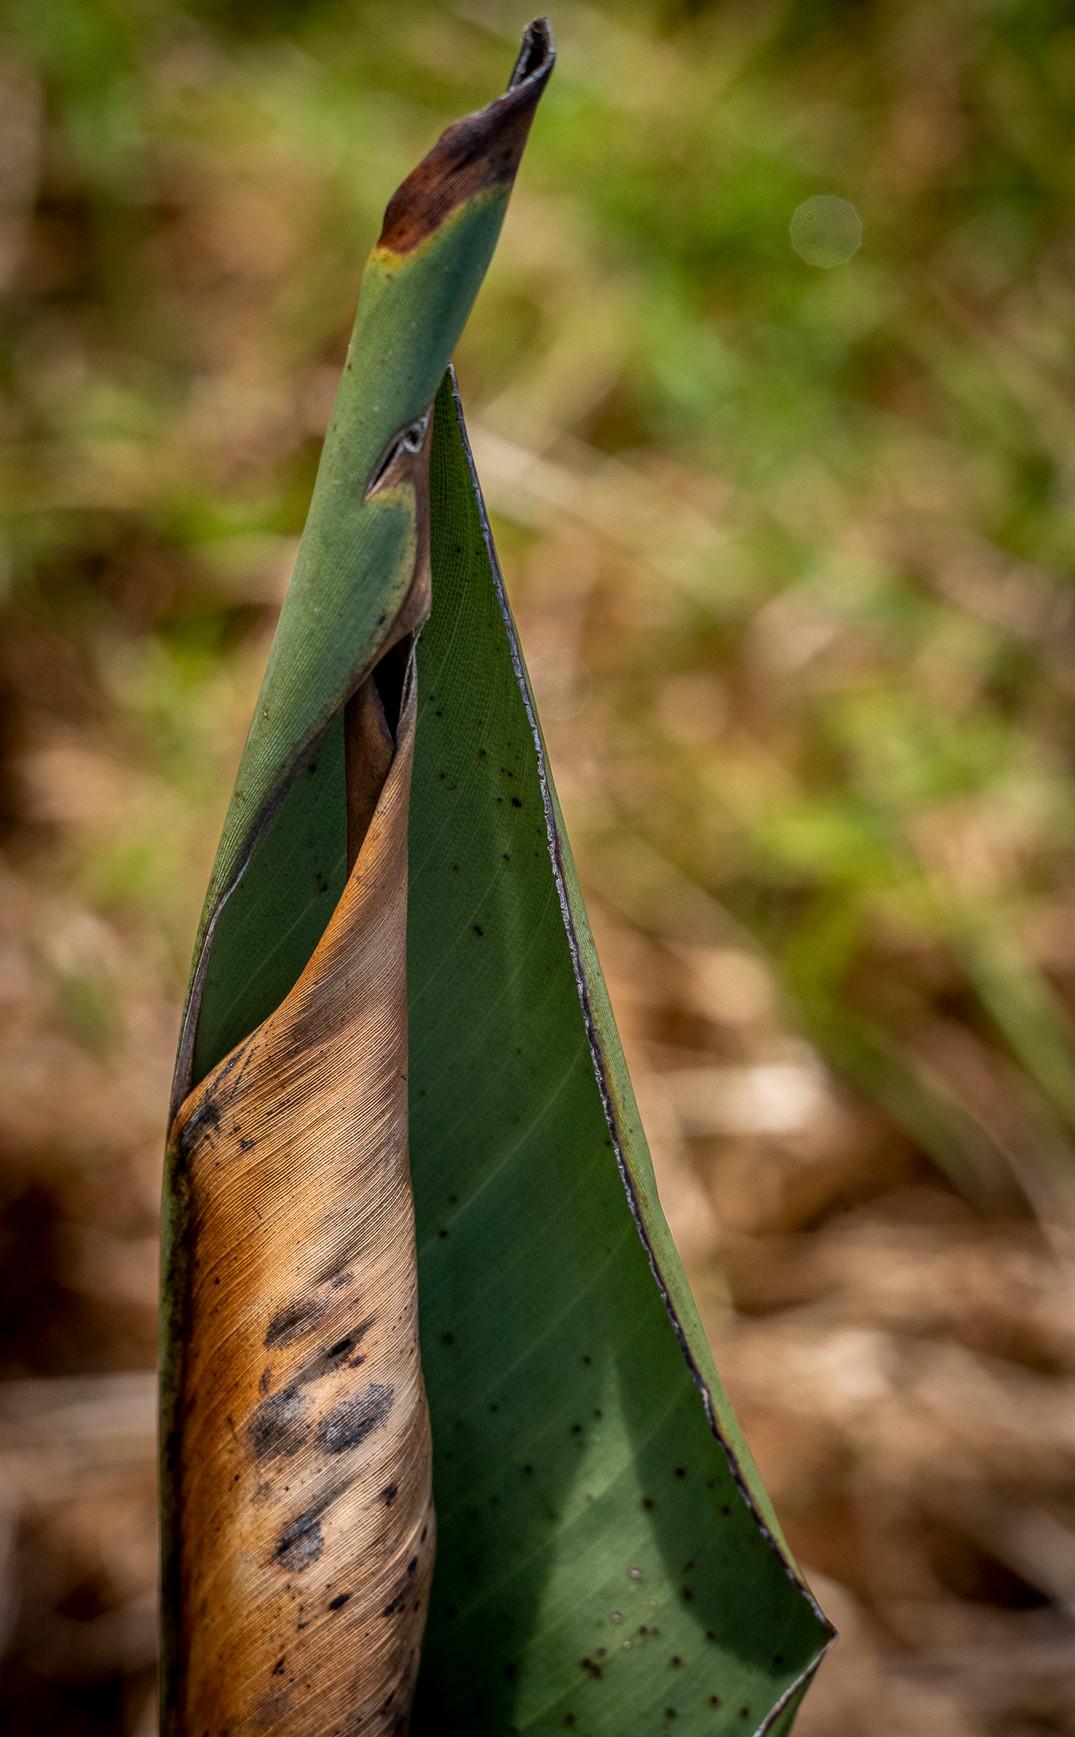 Siddho-Photography-Nature-C-12.jpg